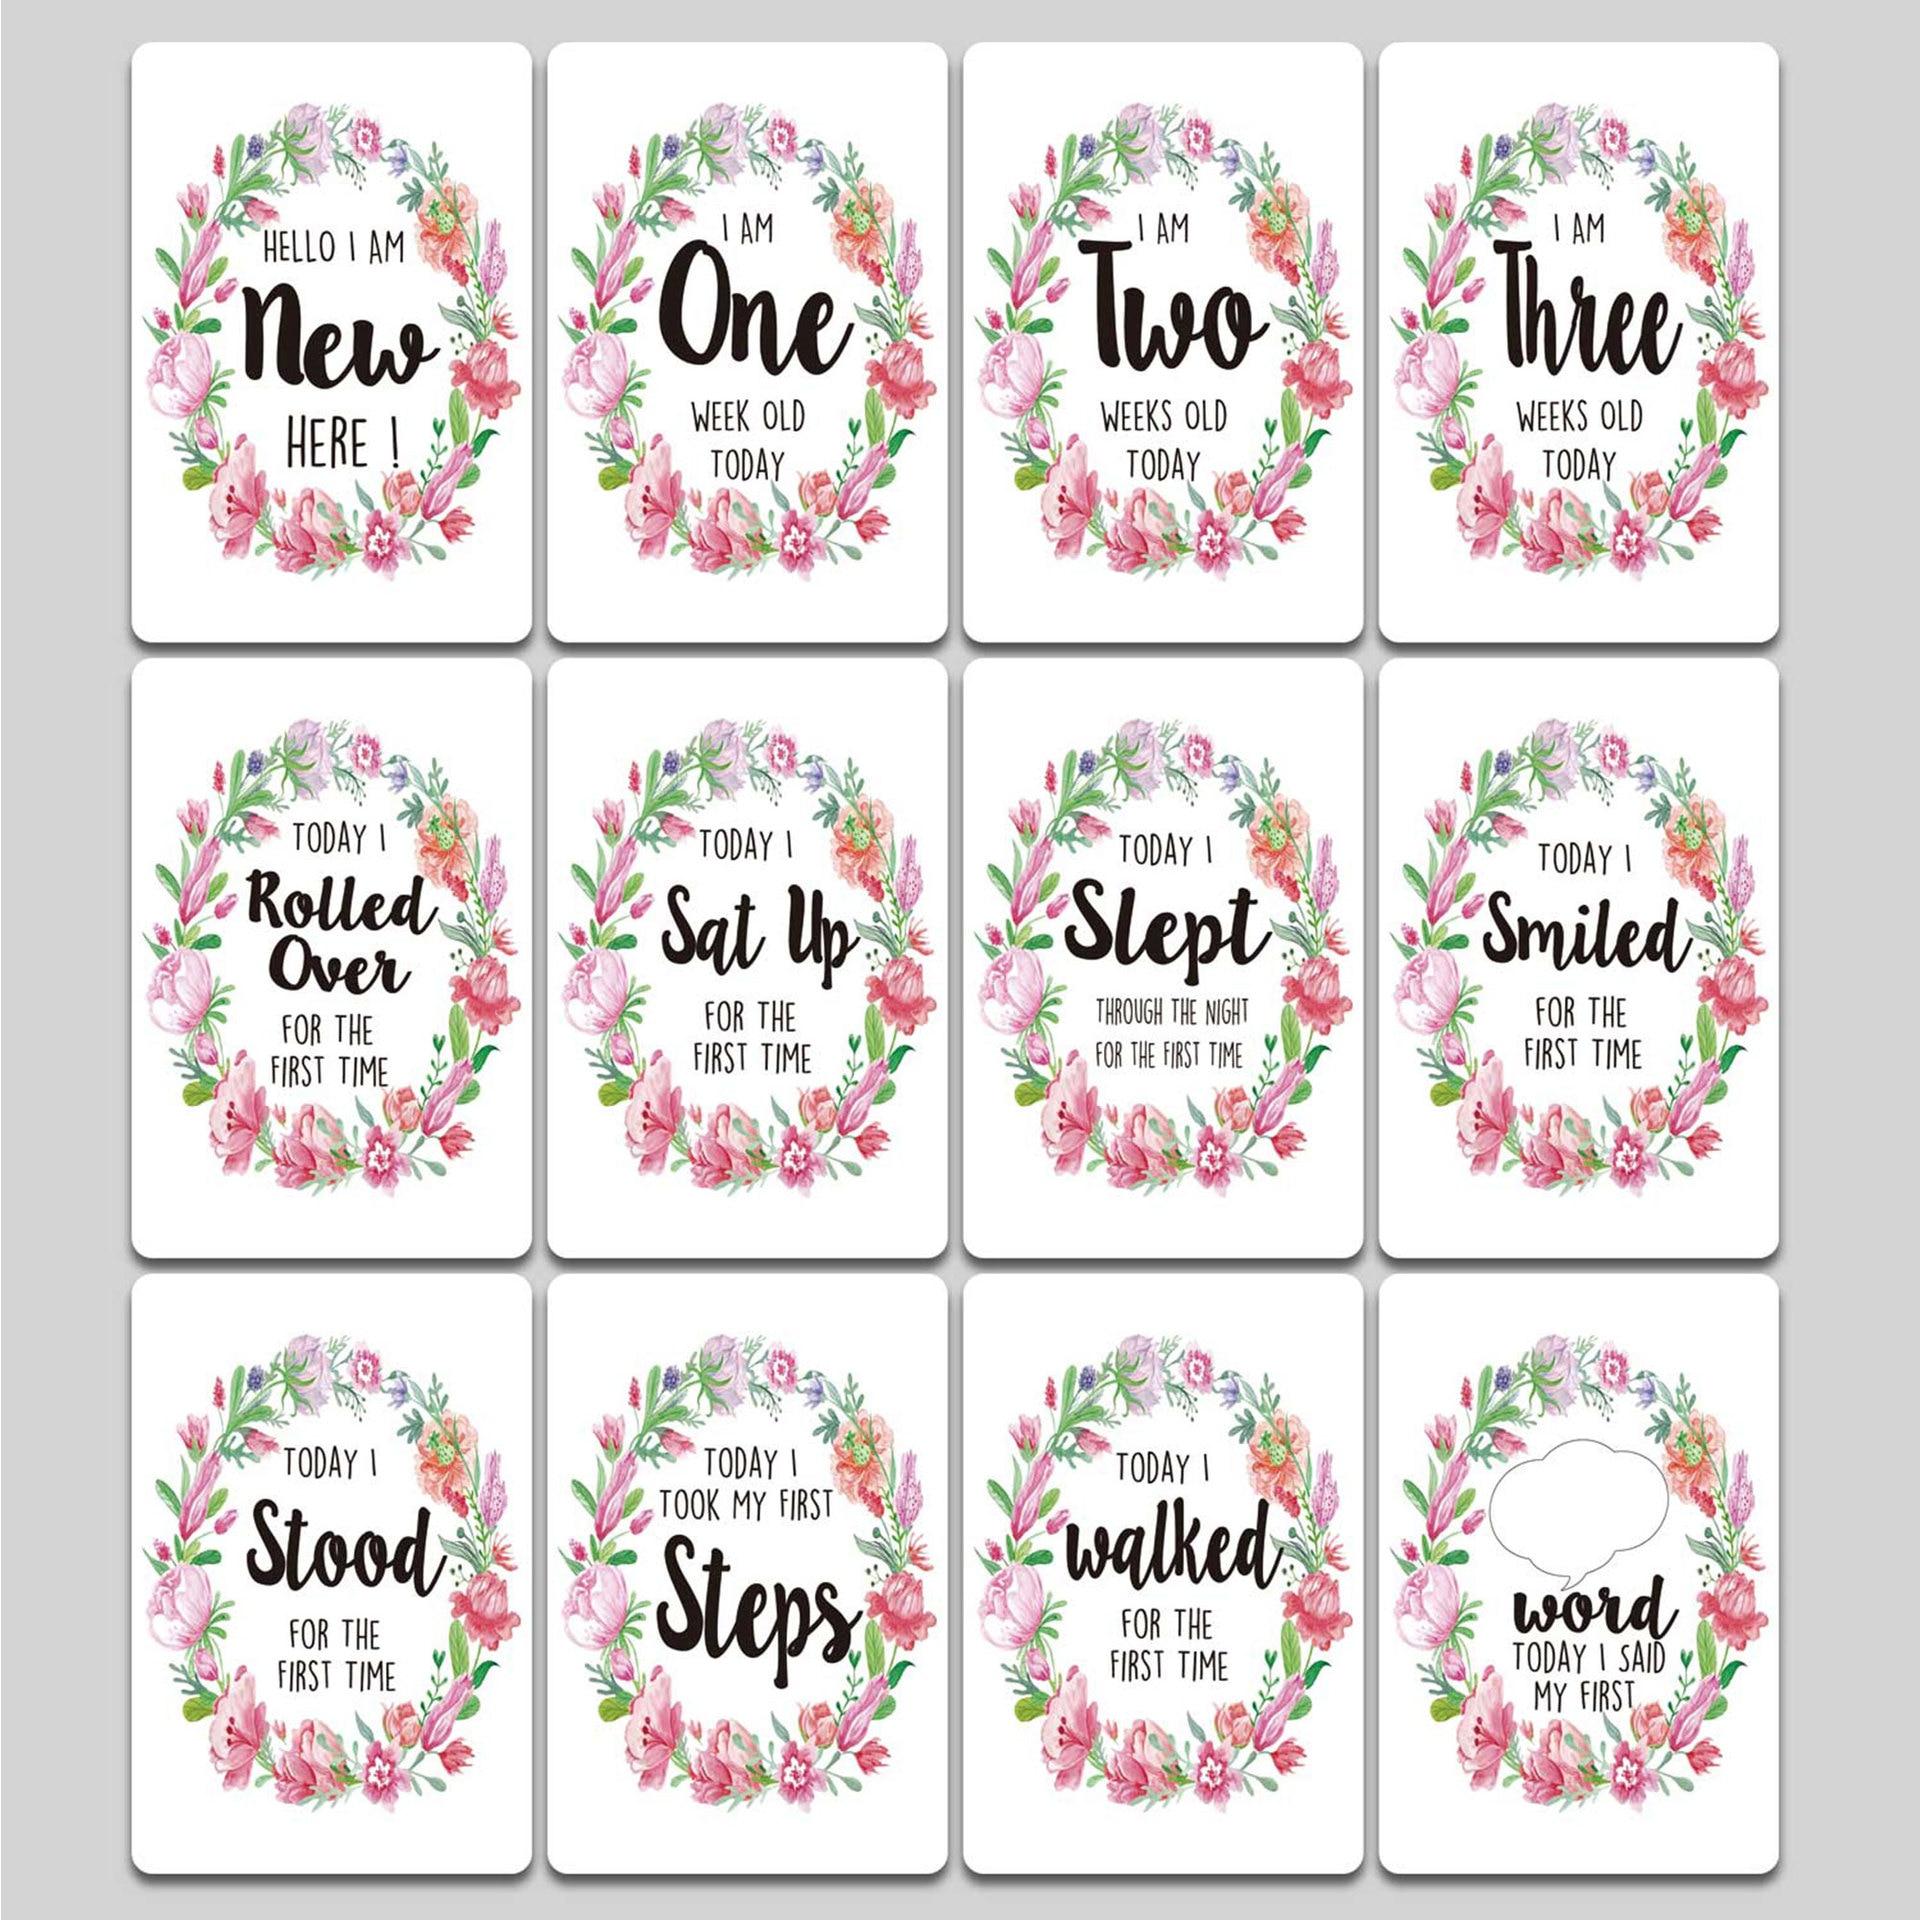 New 12 Sheet Milestone Photo Sharing Cards Gift Set Baby Age Cards - Baby Milestone Cards, Baby Photo Cards - Newborn Photo